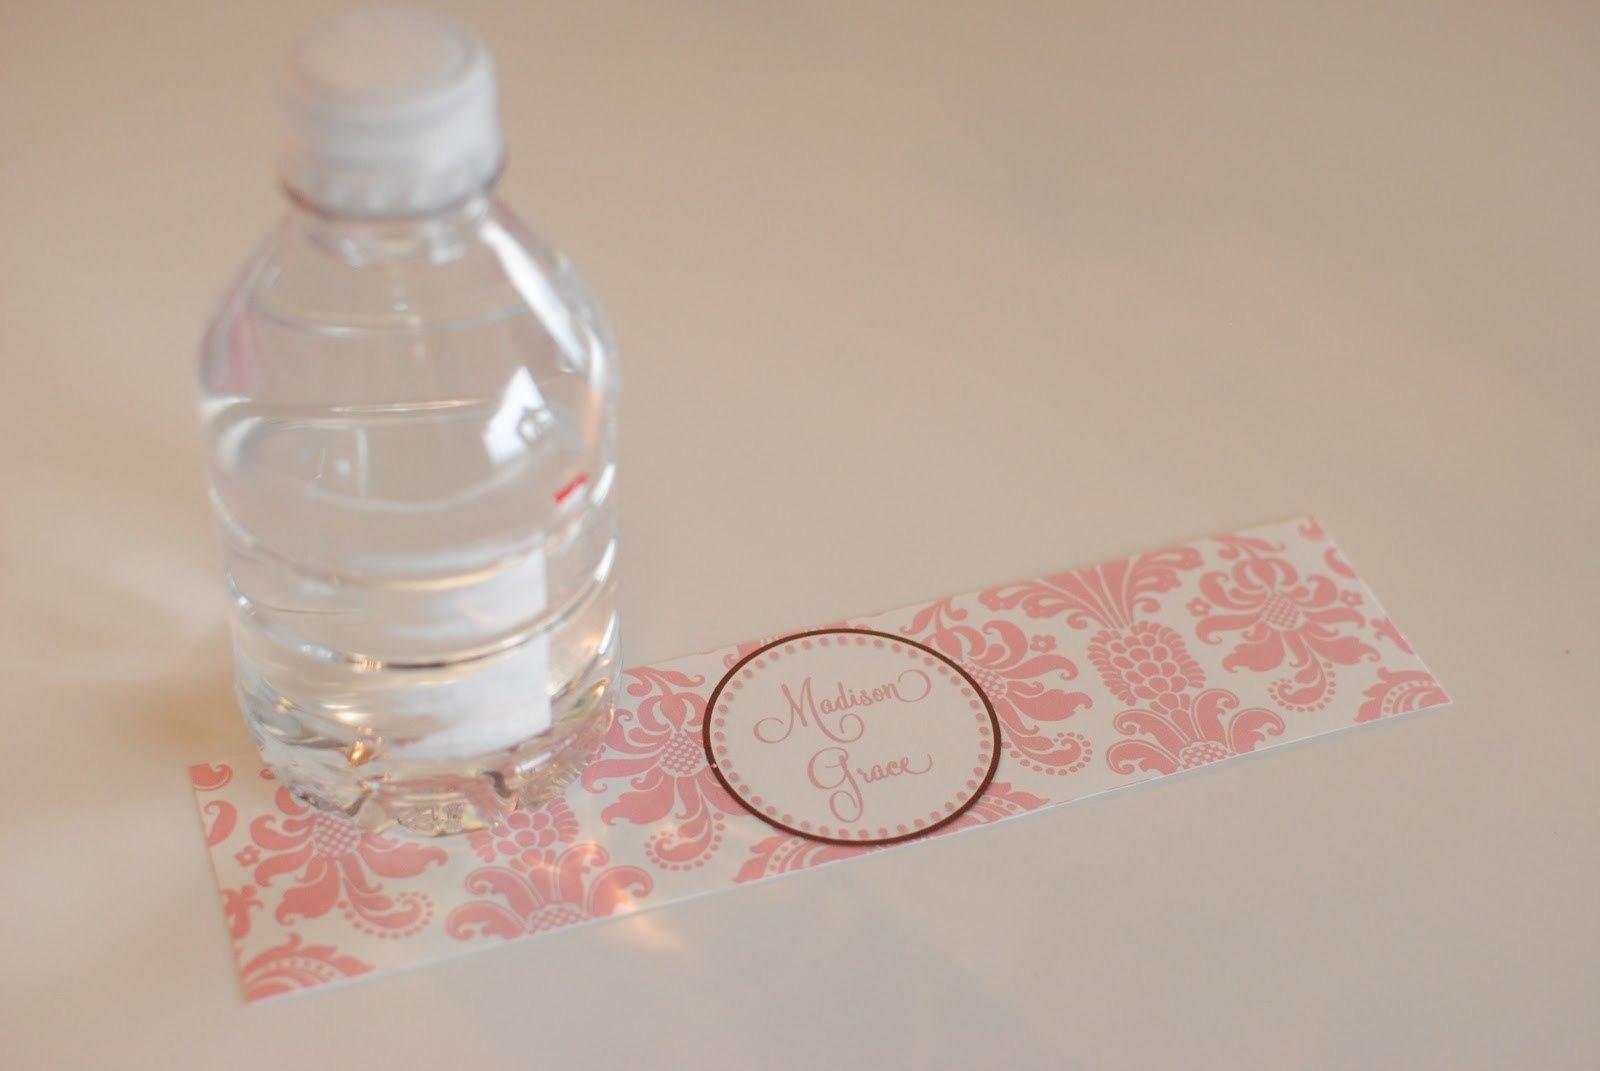 Life Sweet Life Diy Printable Water Bottle Labels Inside Free Water Bottle Labels For Baby Shower Template